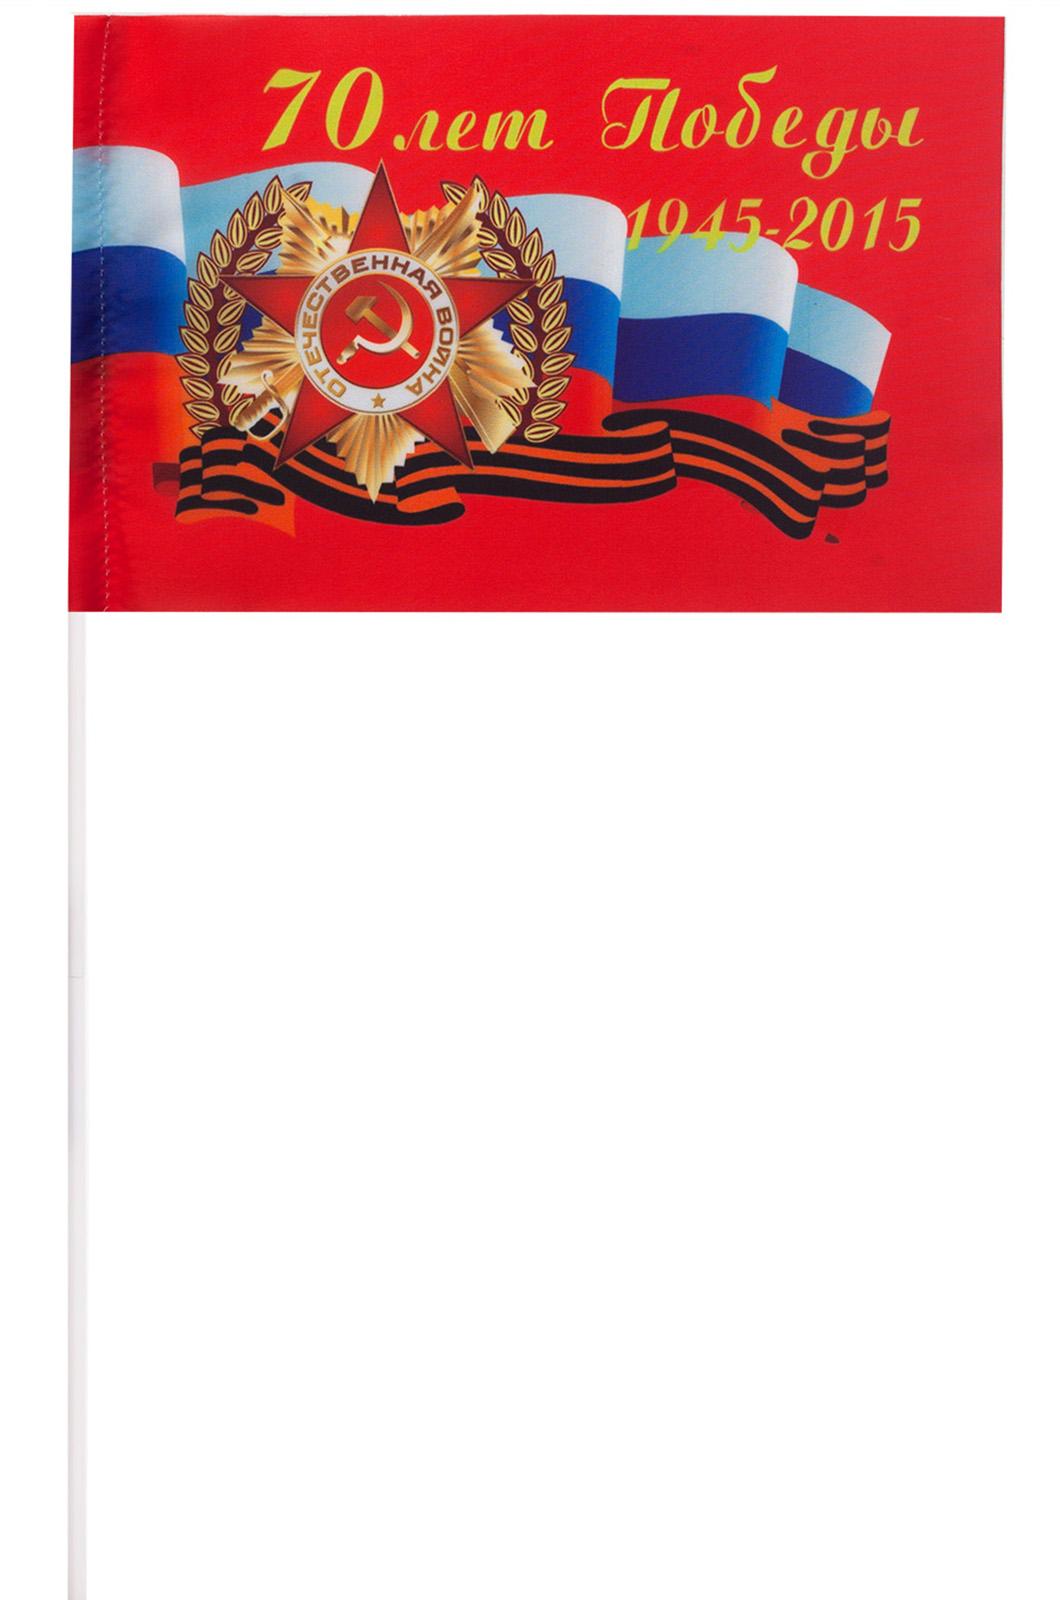 Флажок для парада 70 лет Победы